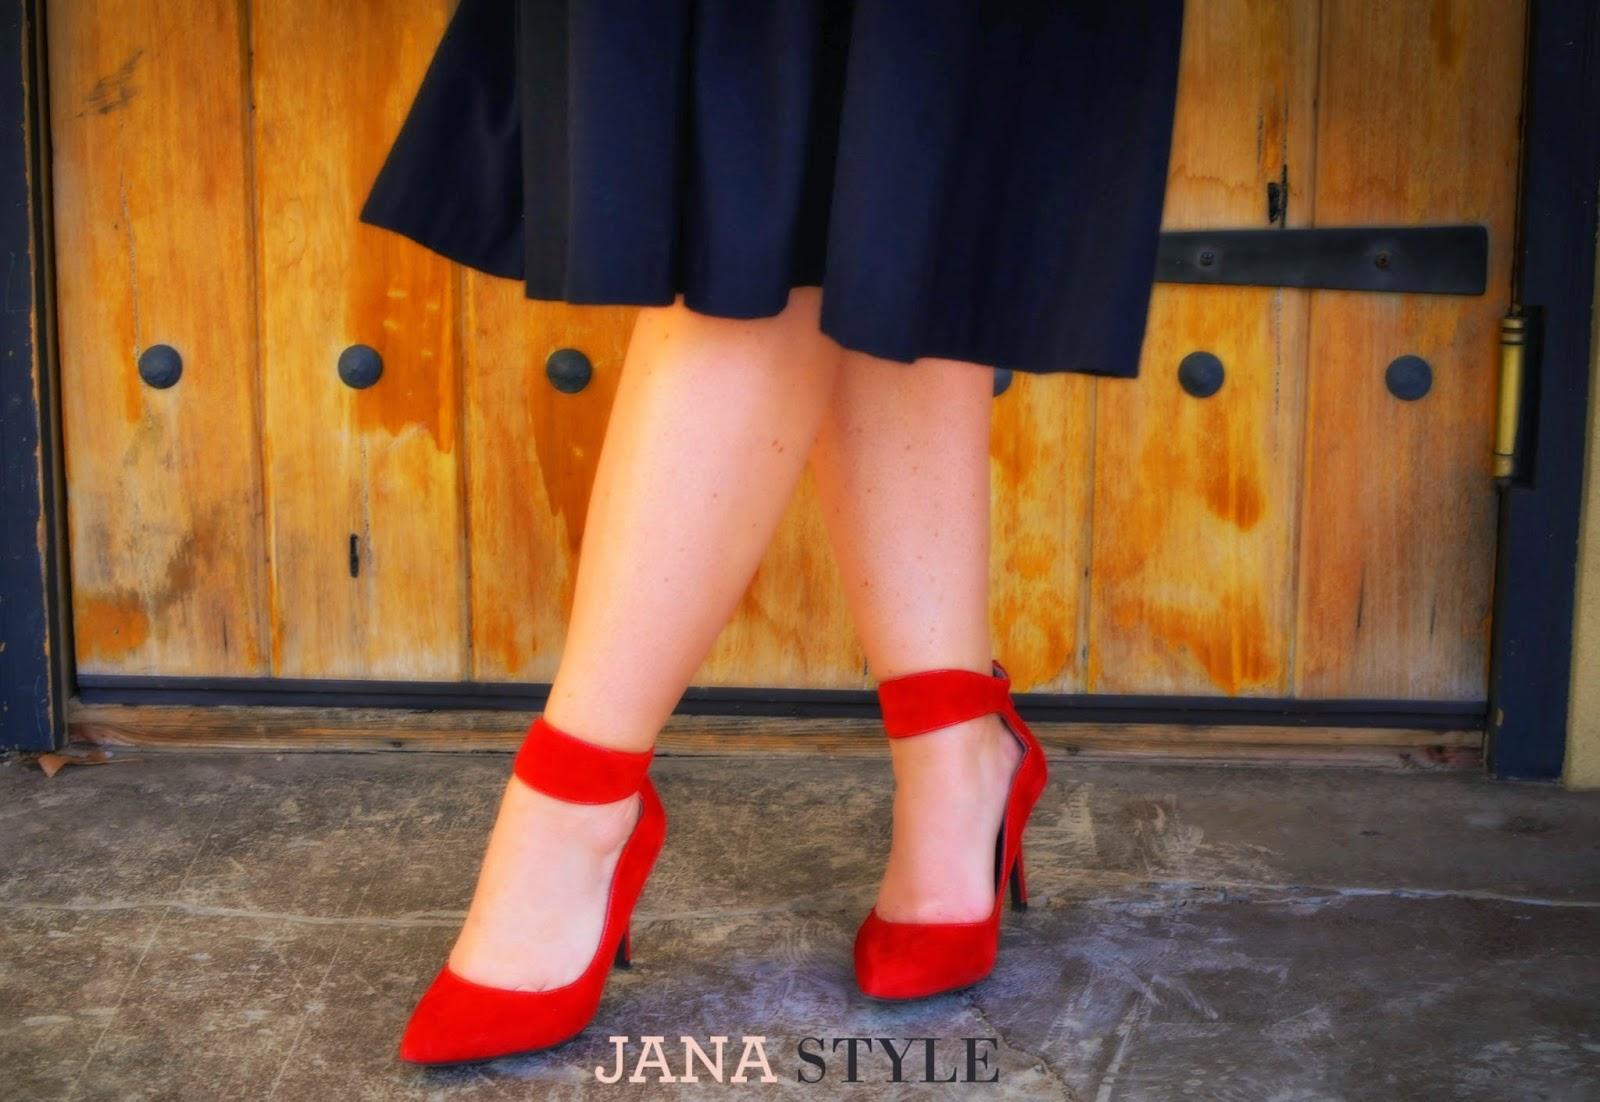 Midi Skirt & Red Shoes | JANA STYLE | Kansas City Fashion Blogger